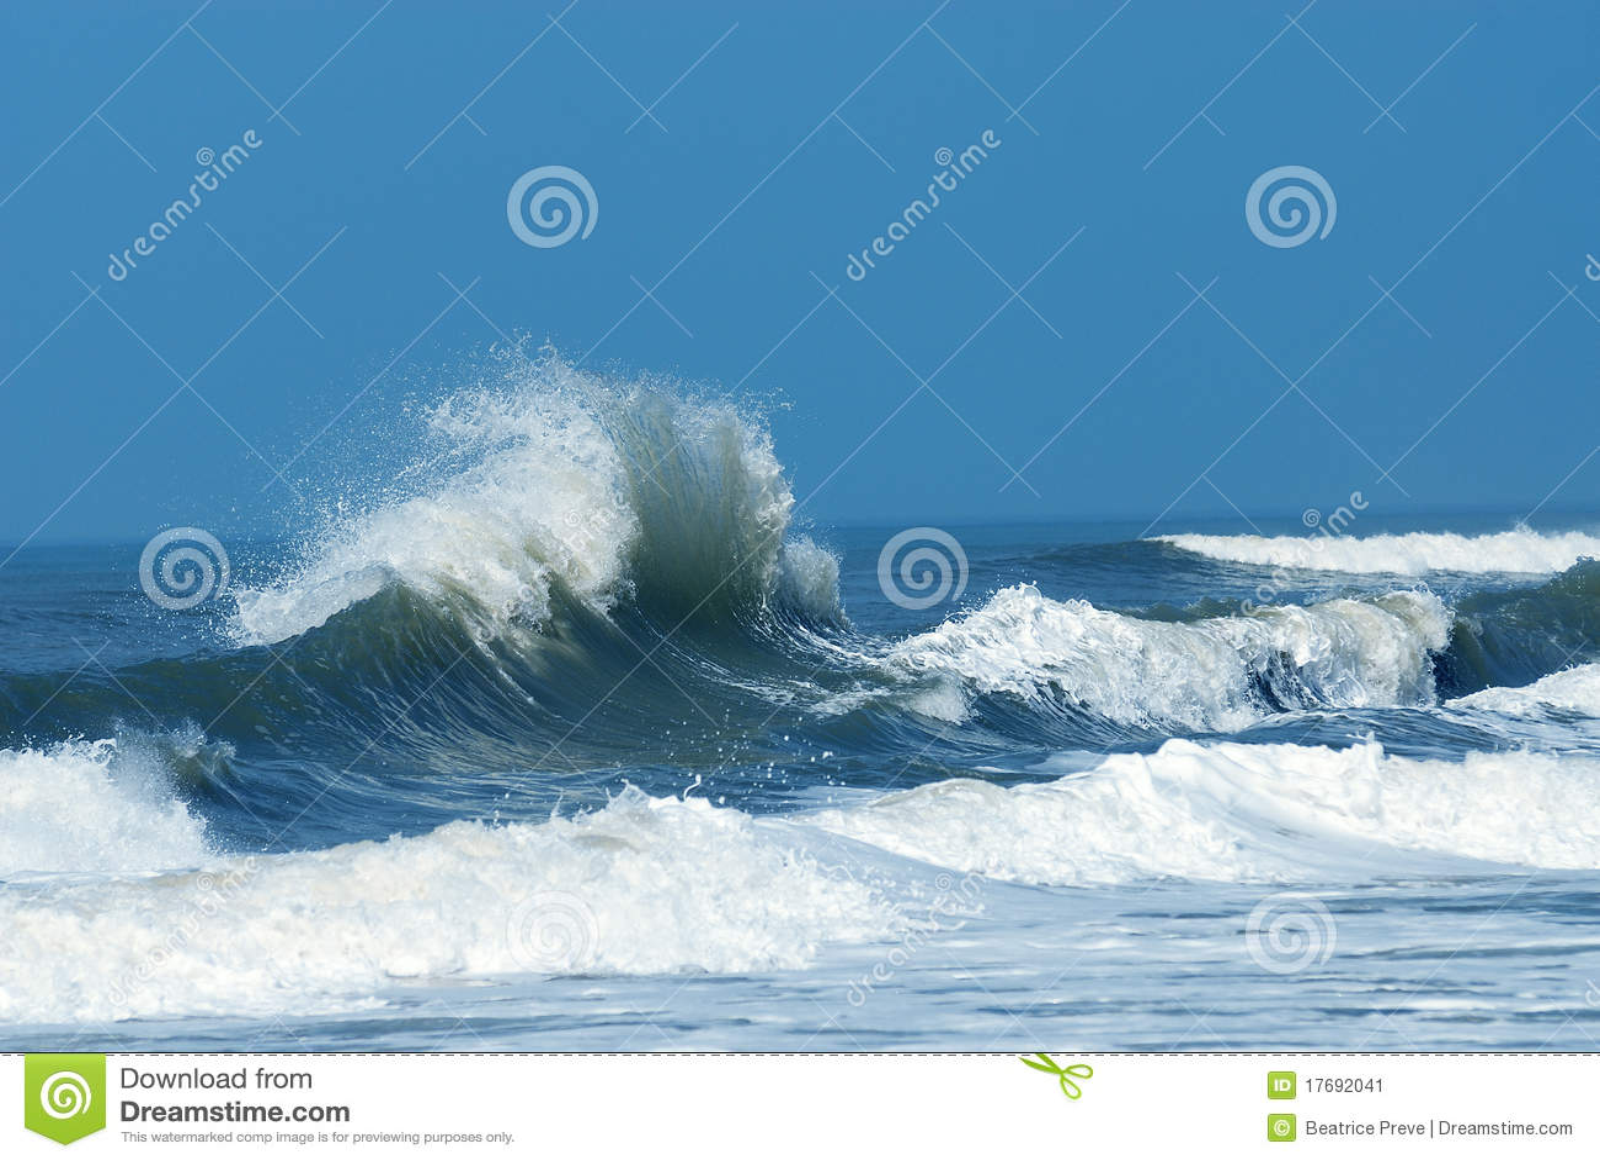 разбивая мощная волна